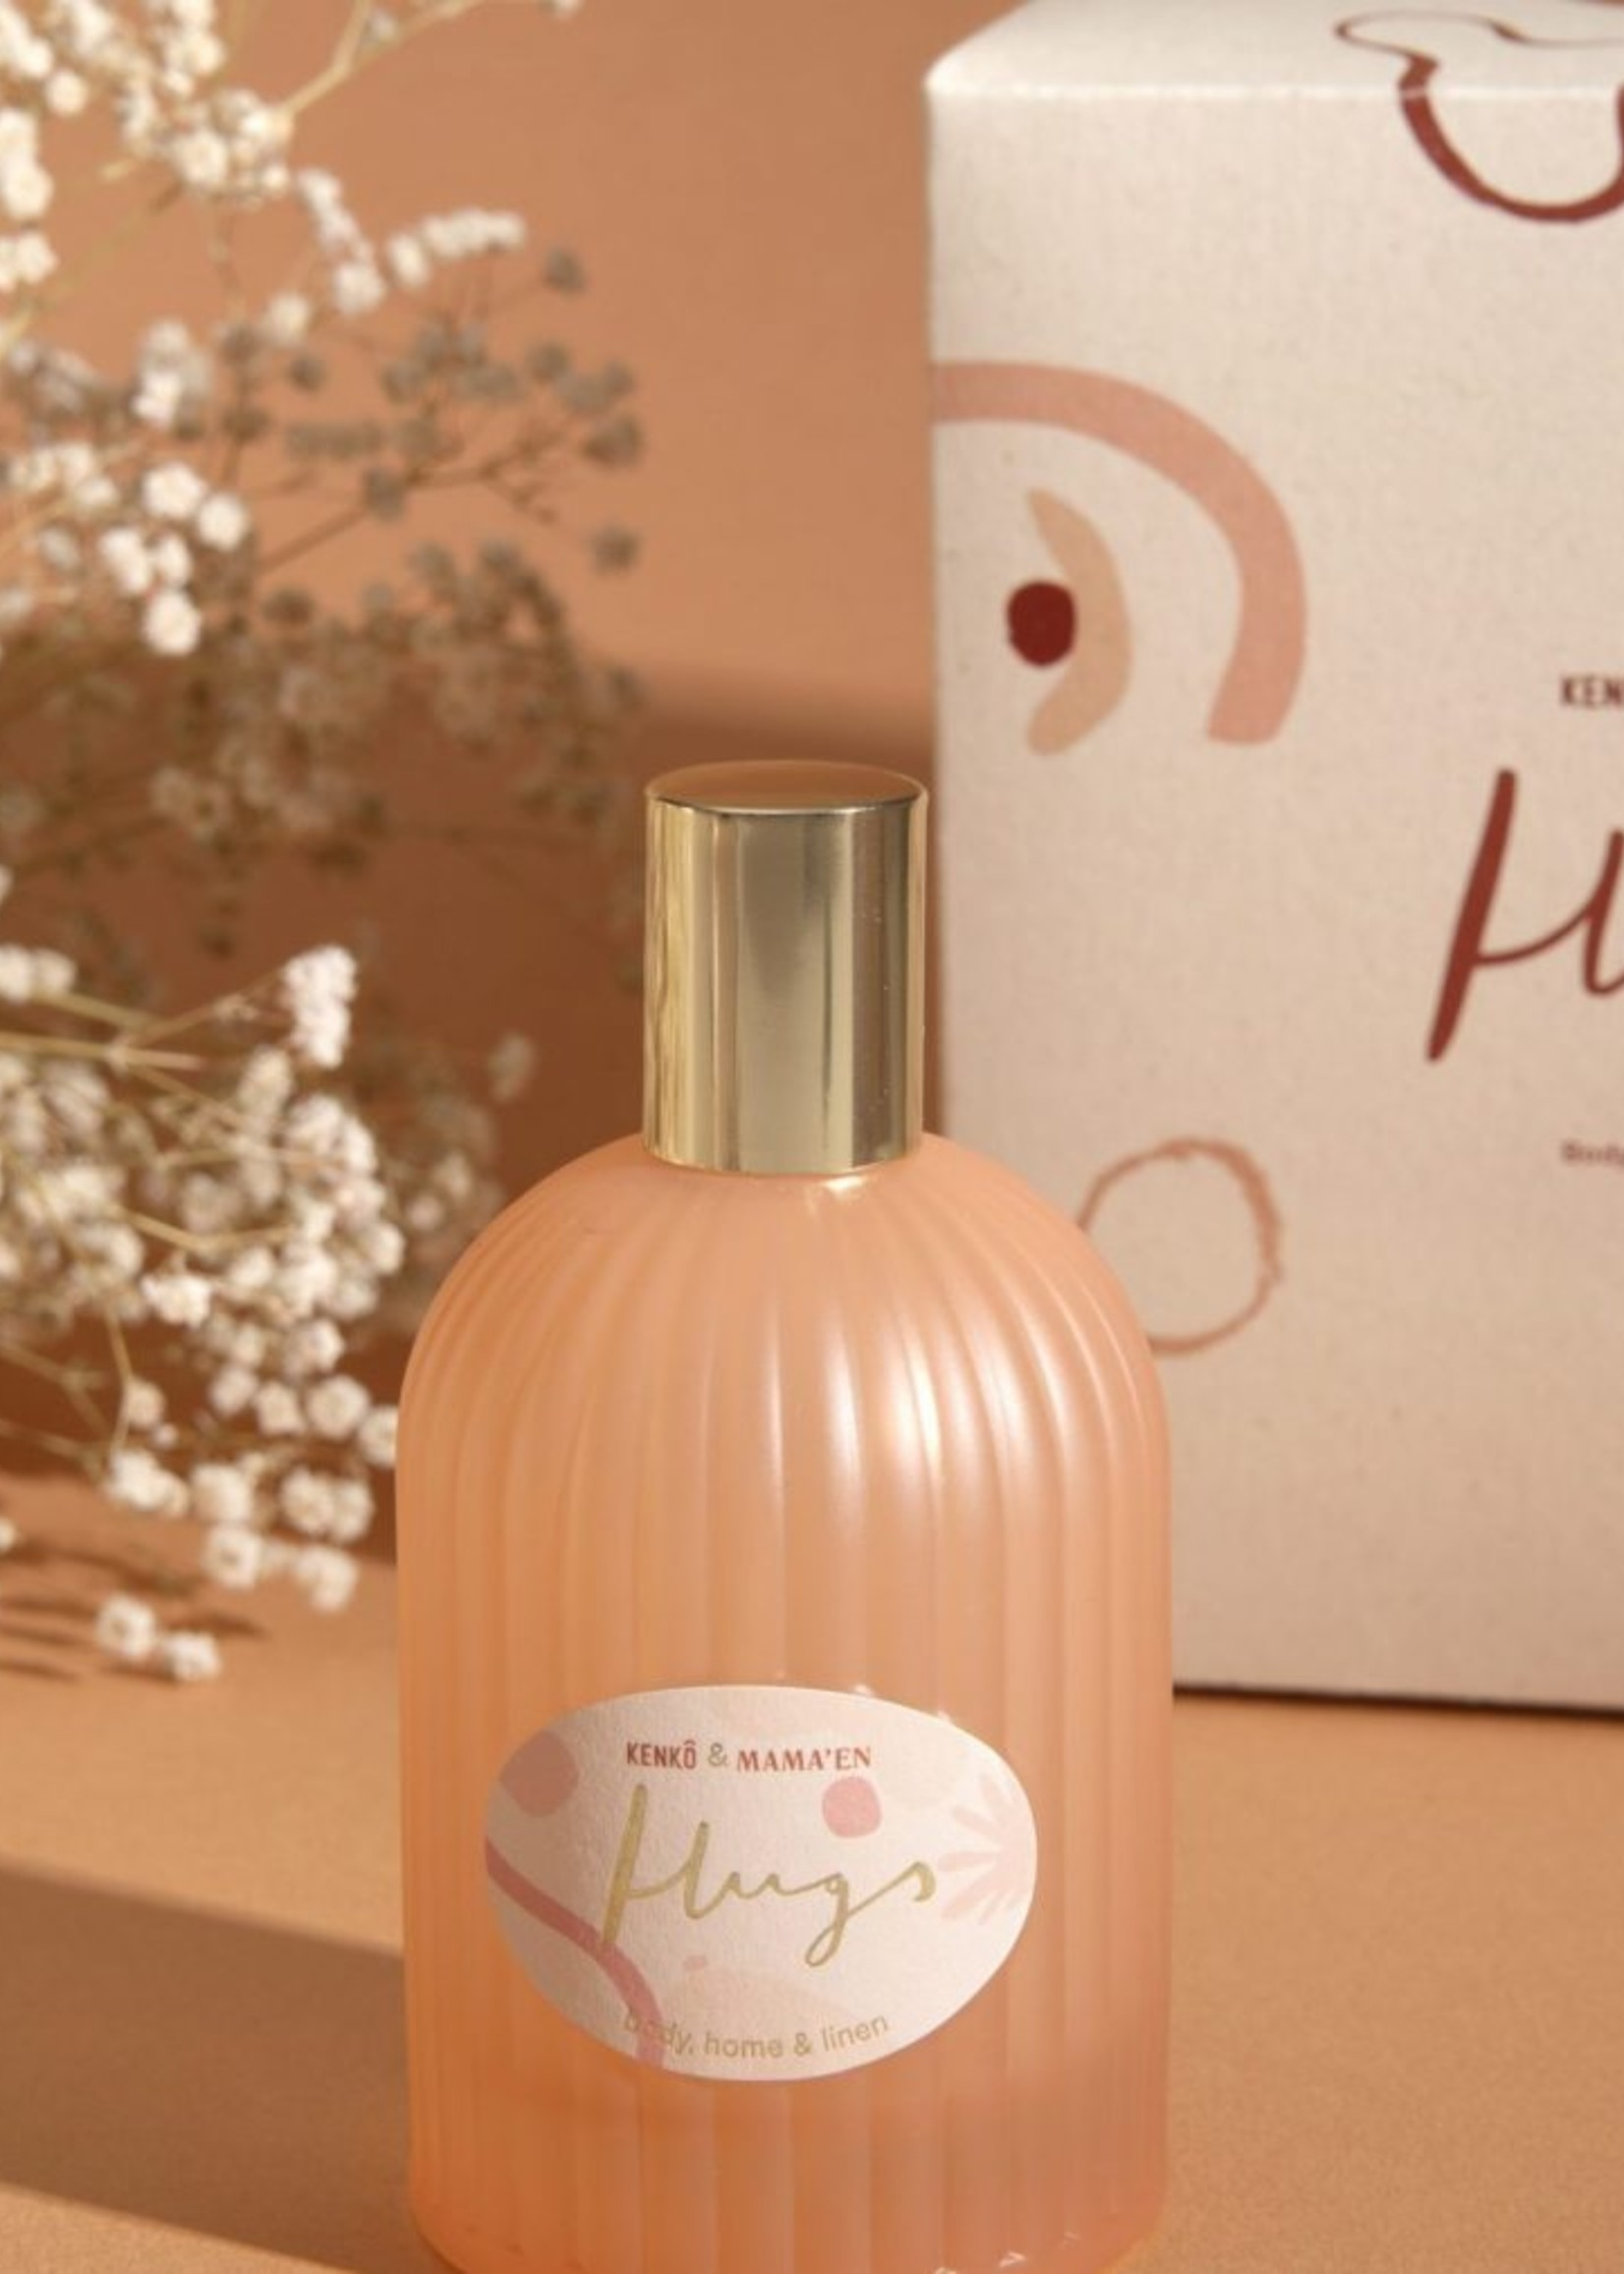 Kenko Skincare Hugs - Body, Home & Linen Spray